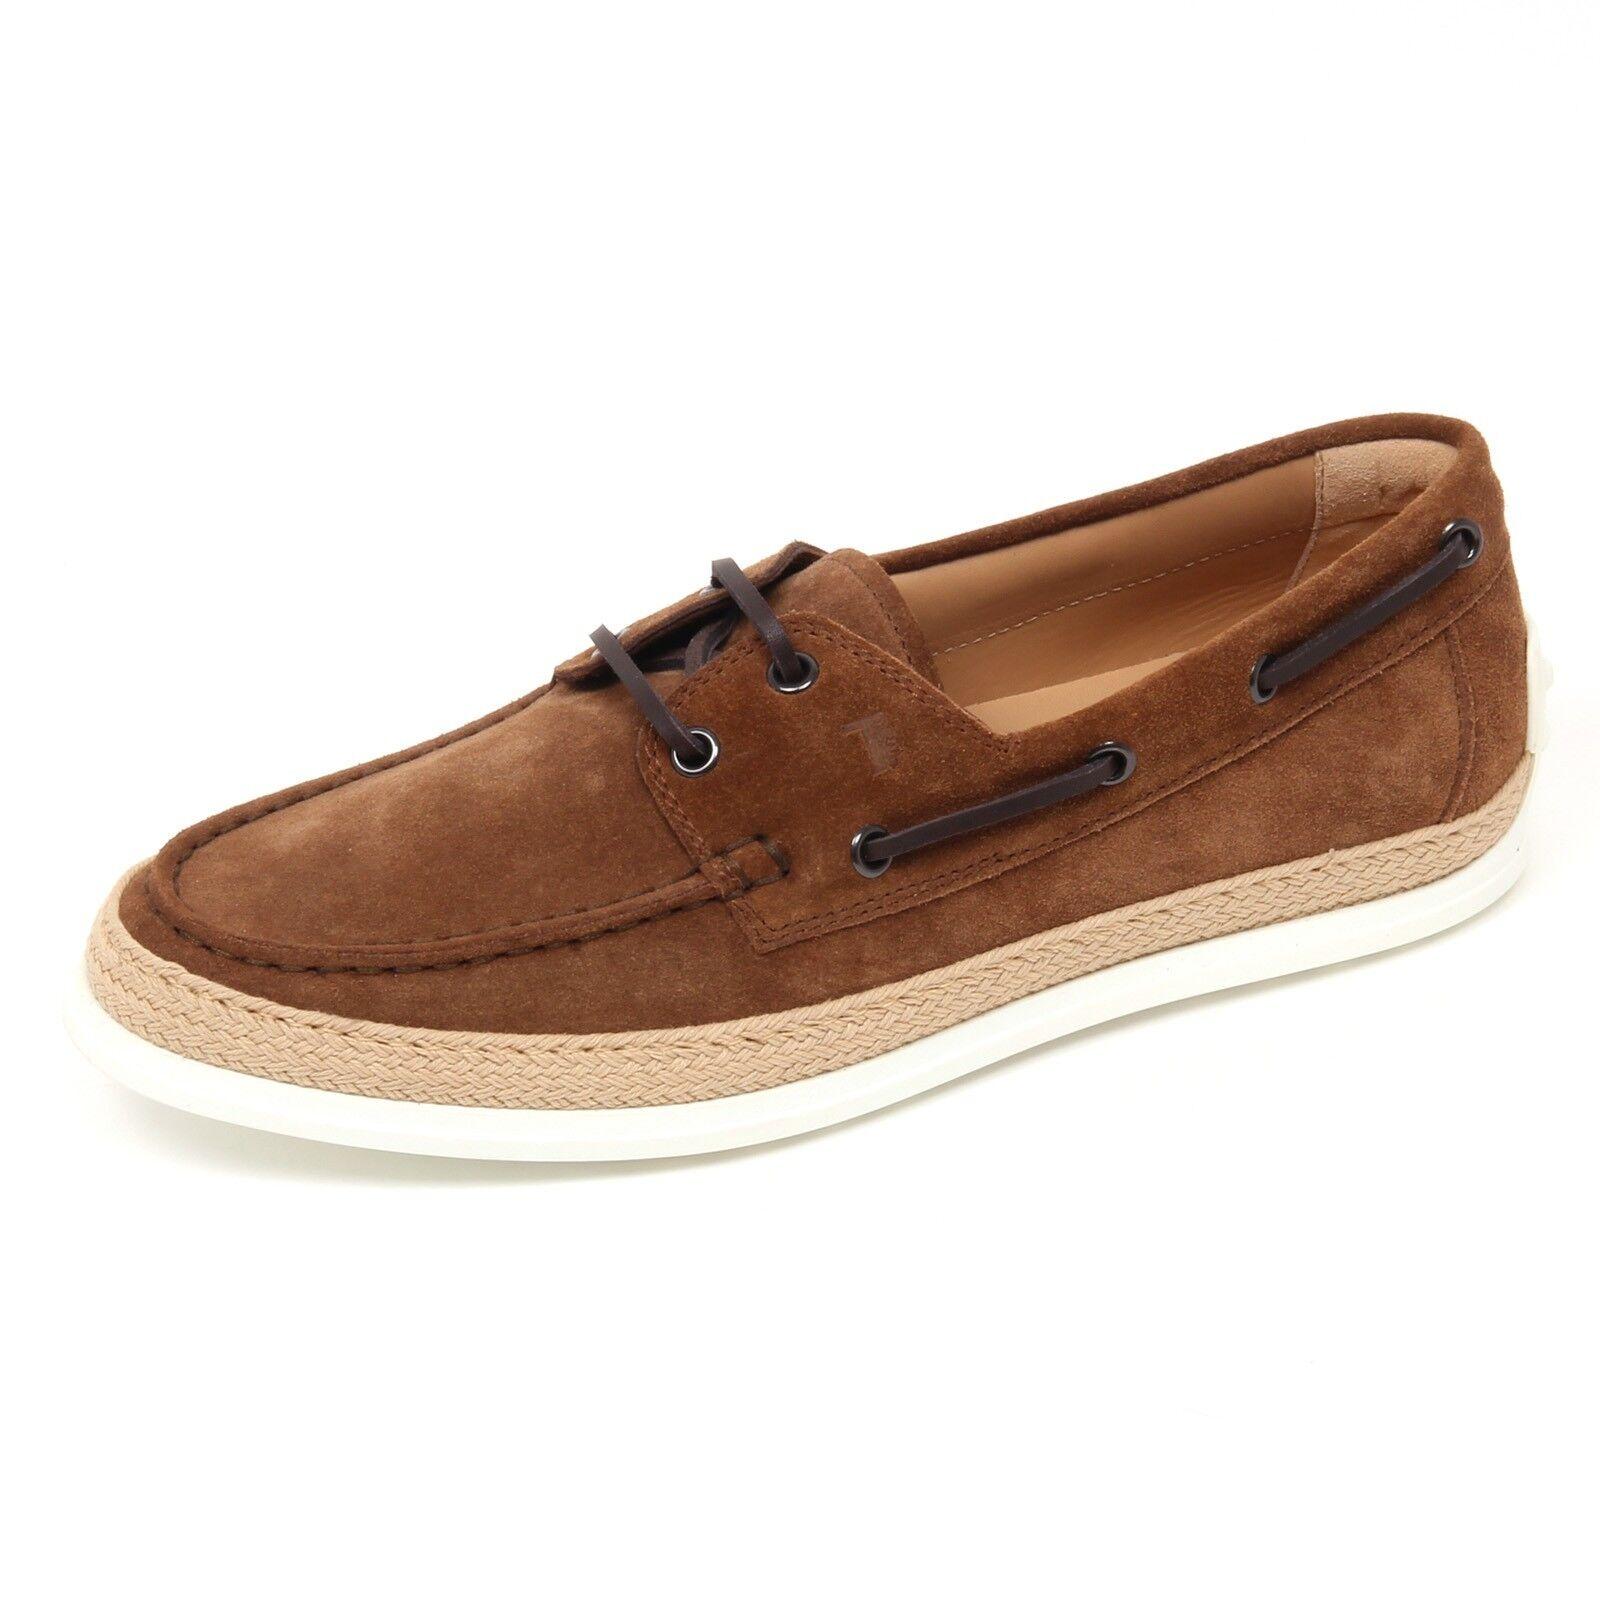 C9976 barca uomo TOD'S scarpa mocassino rafia marrone loafer shoe man